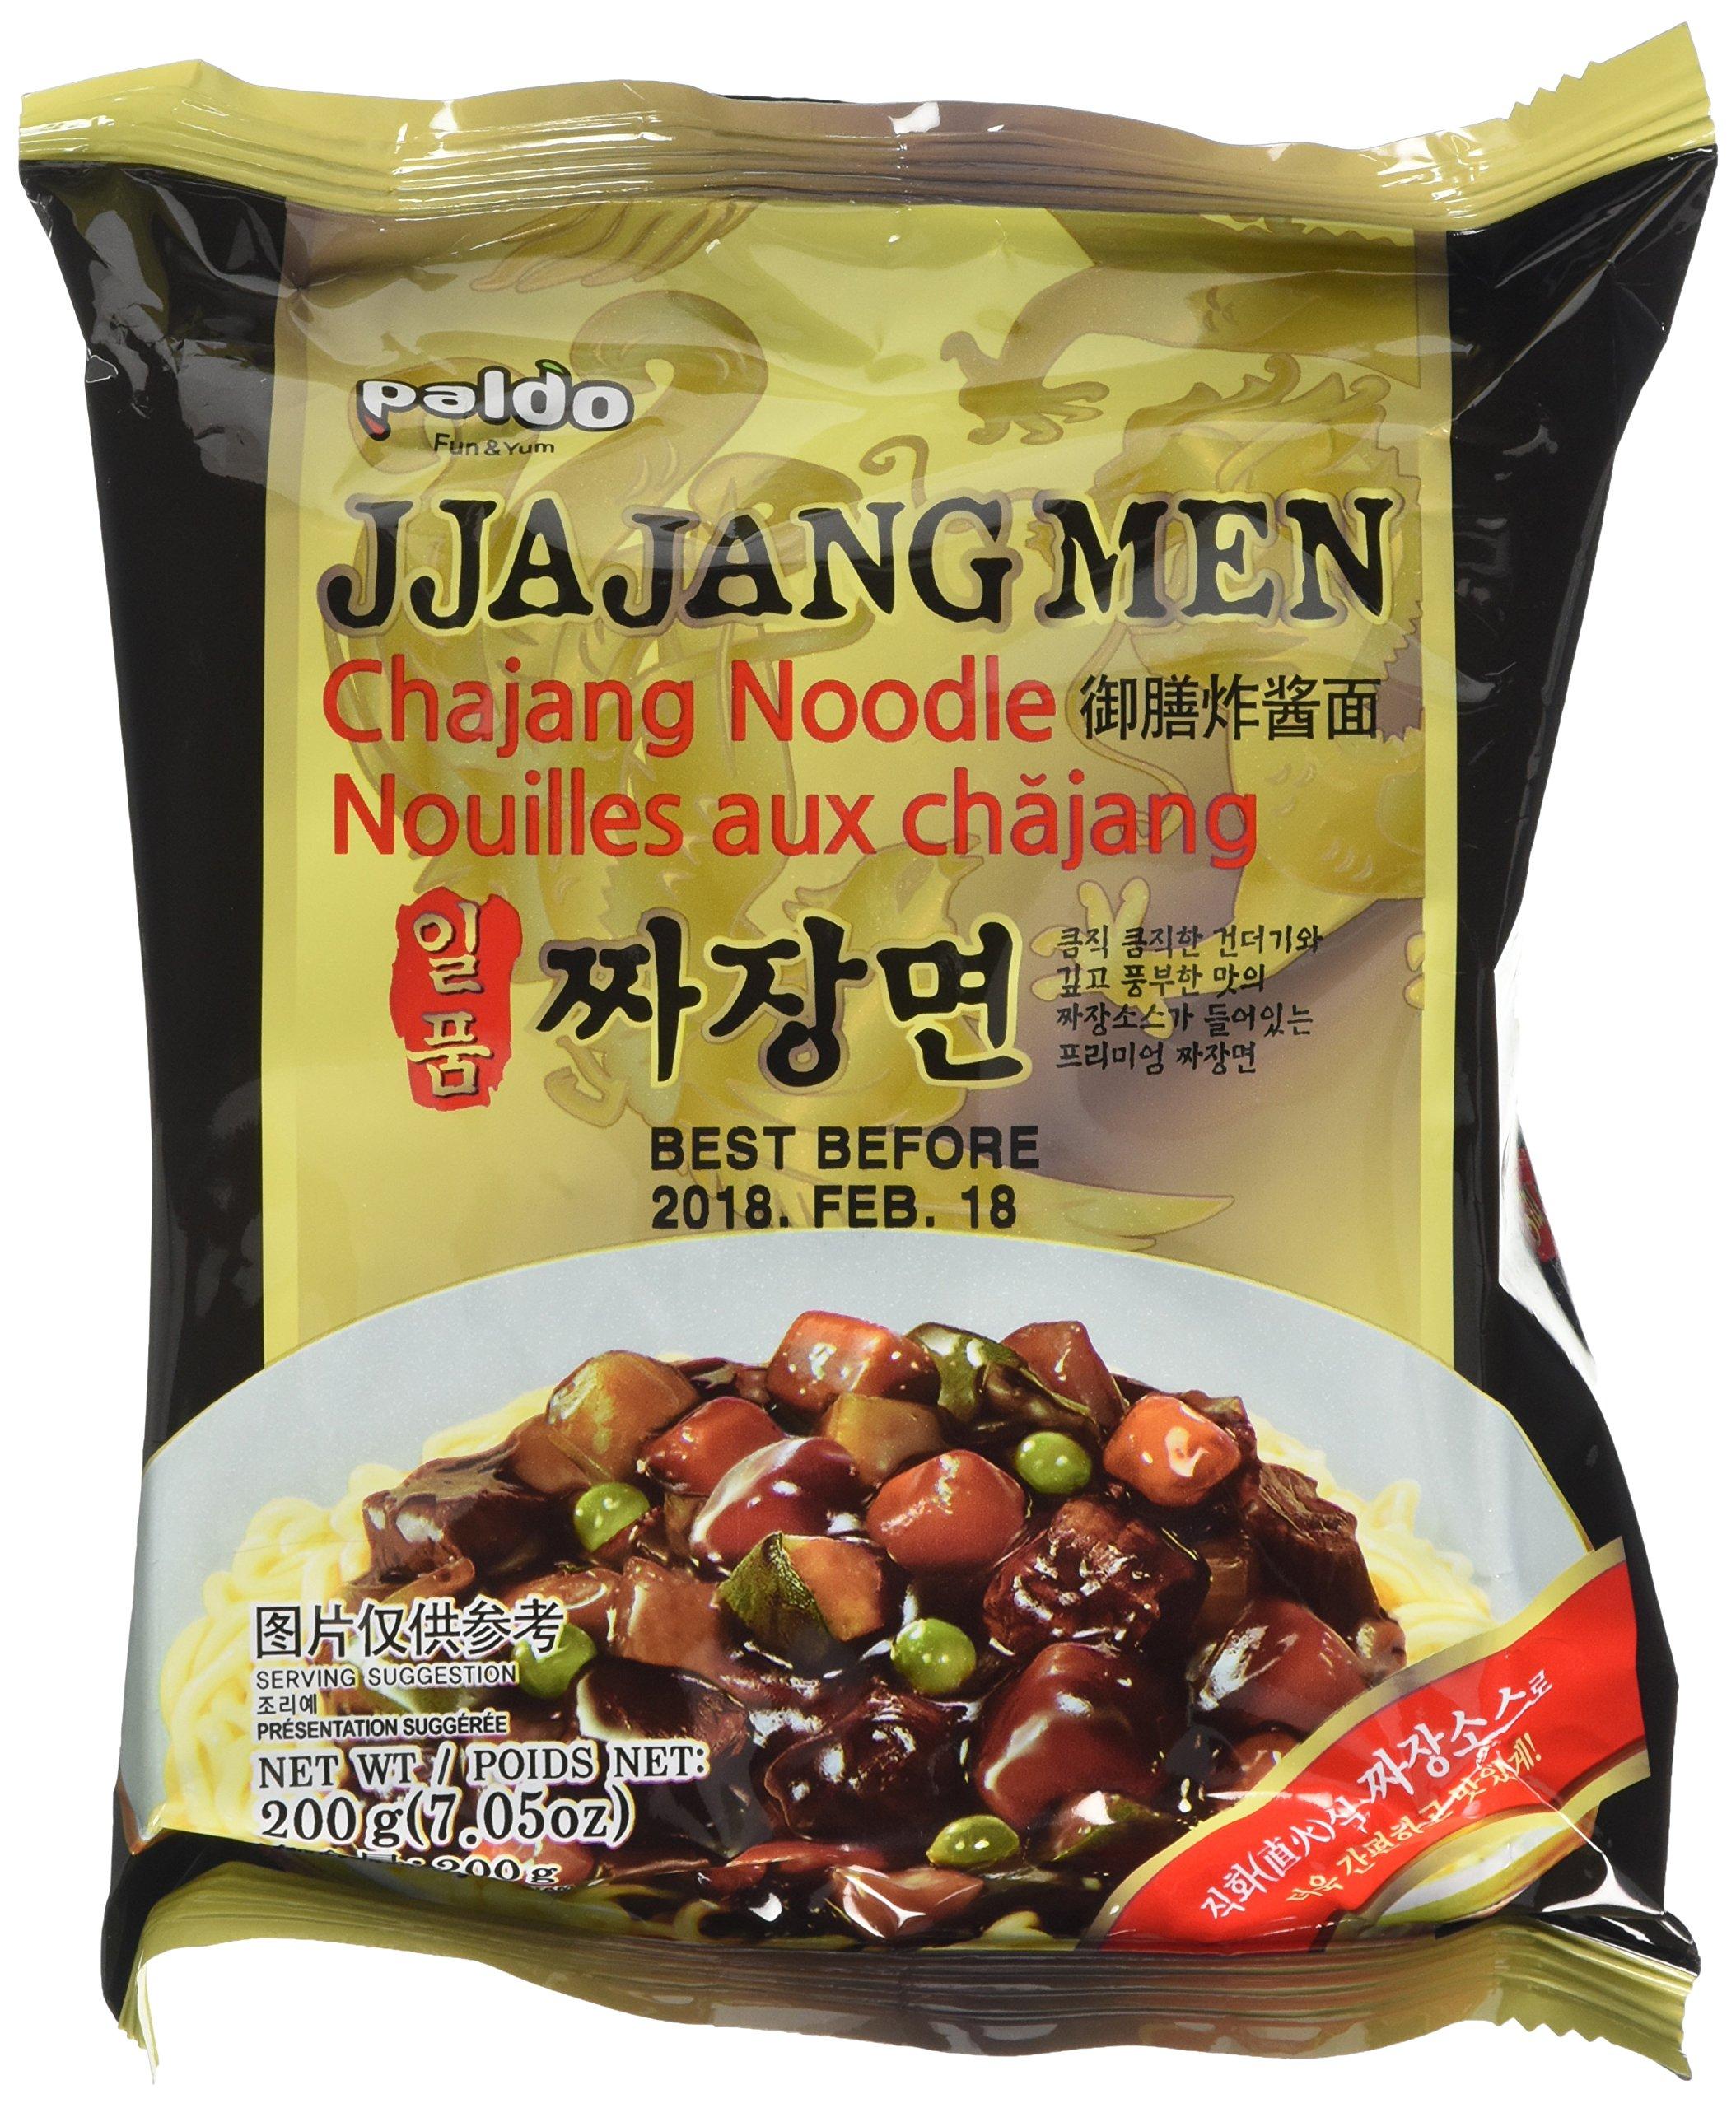 Paldo Ilpoom Jia Jangmen (Chajang Noodle) 200g (Pack of 4)